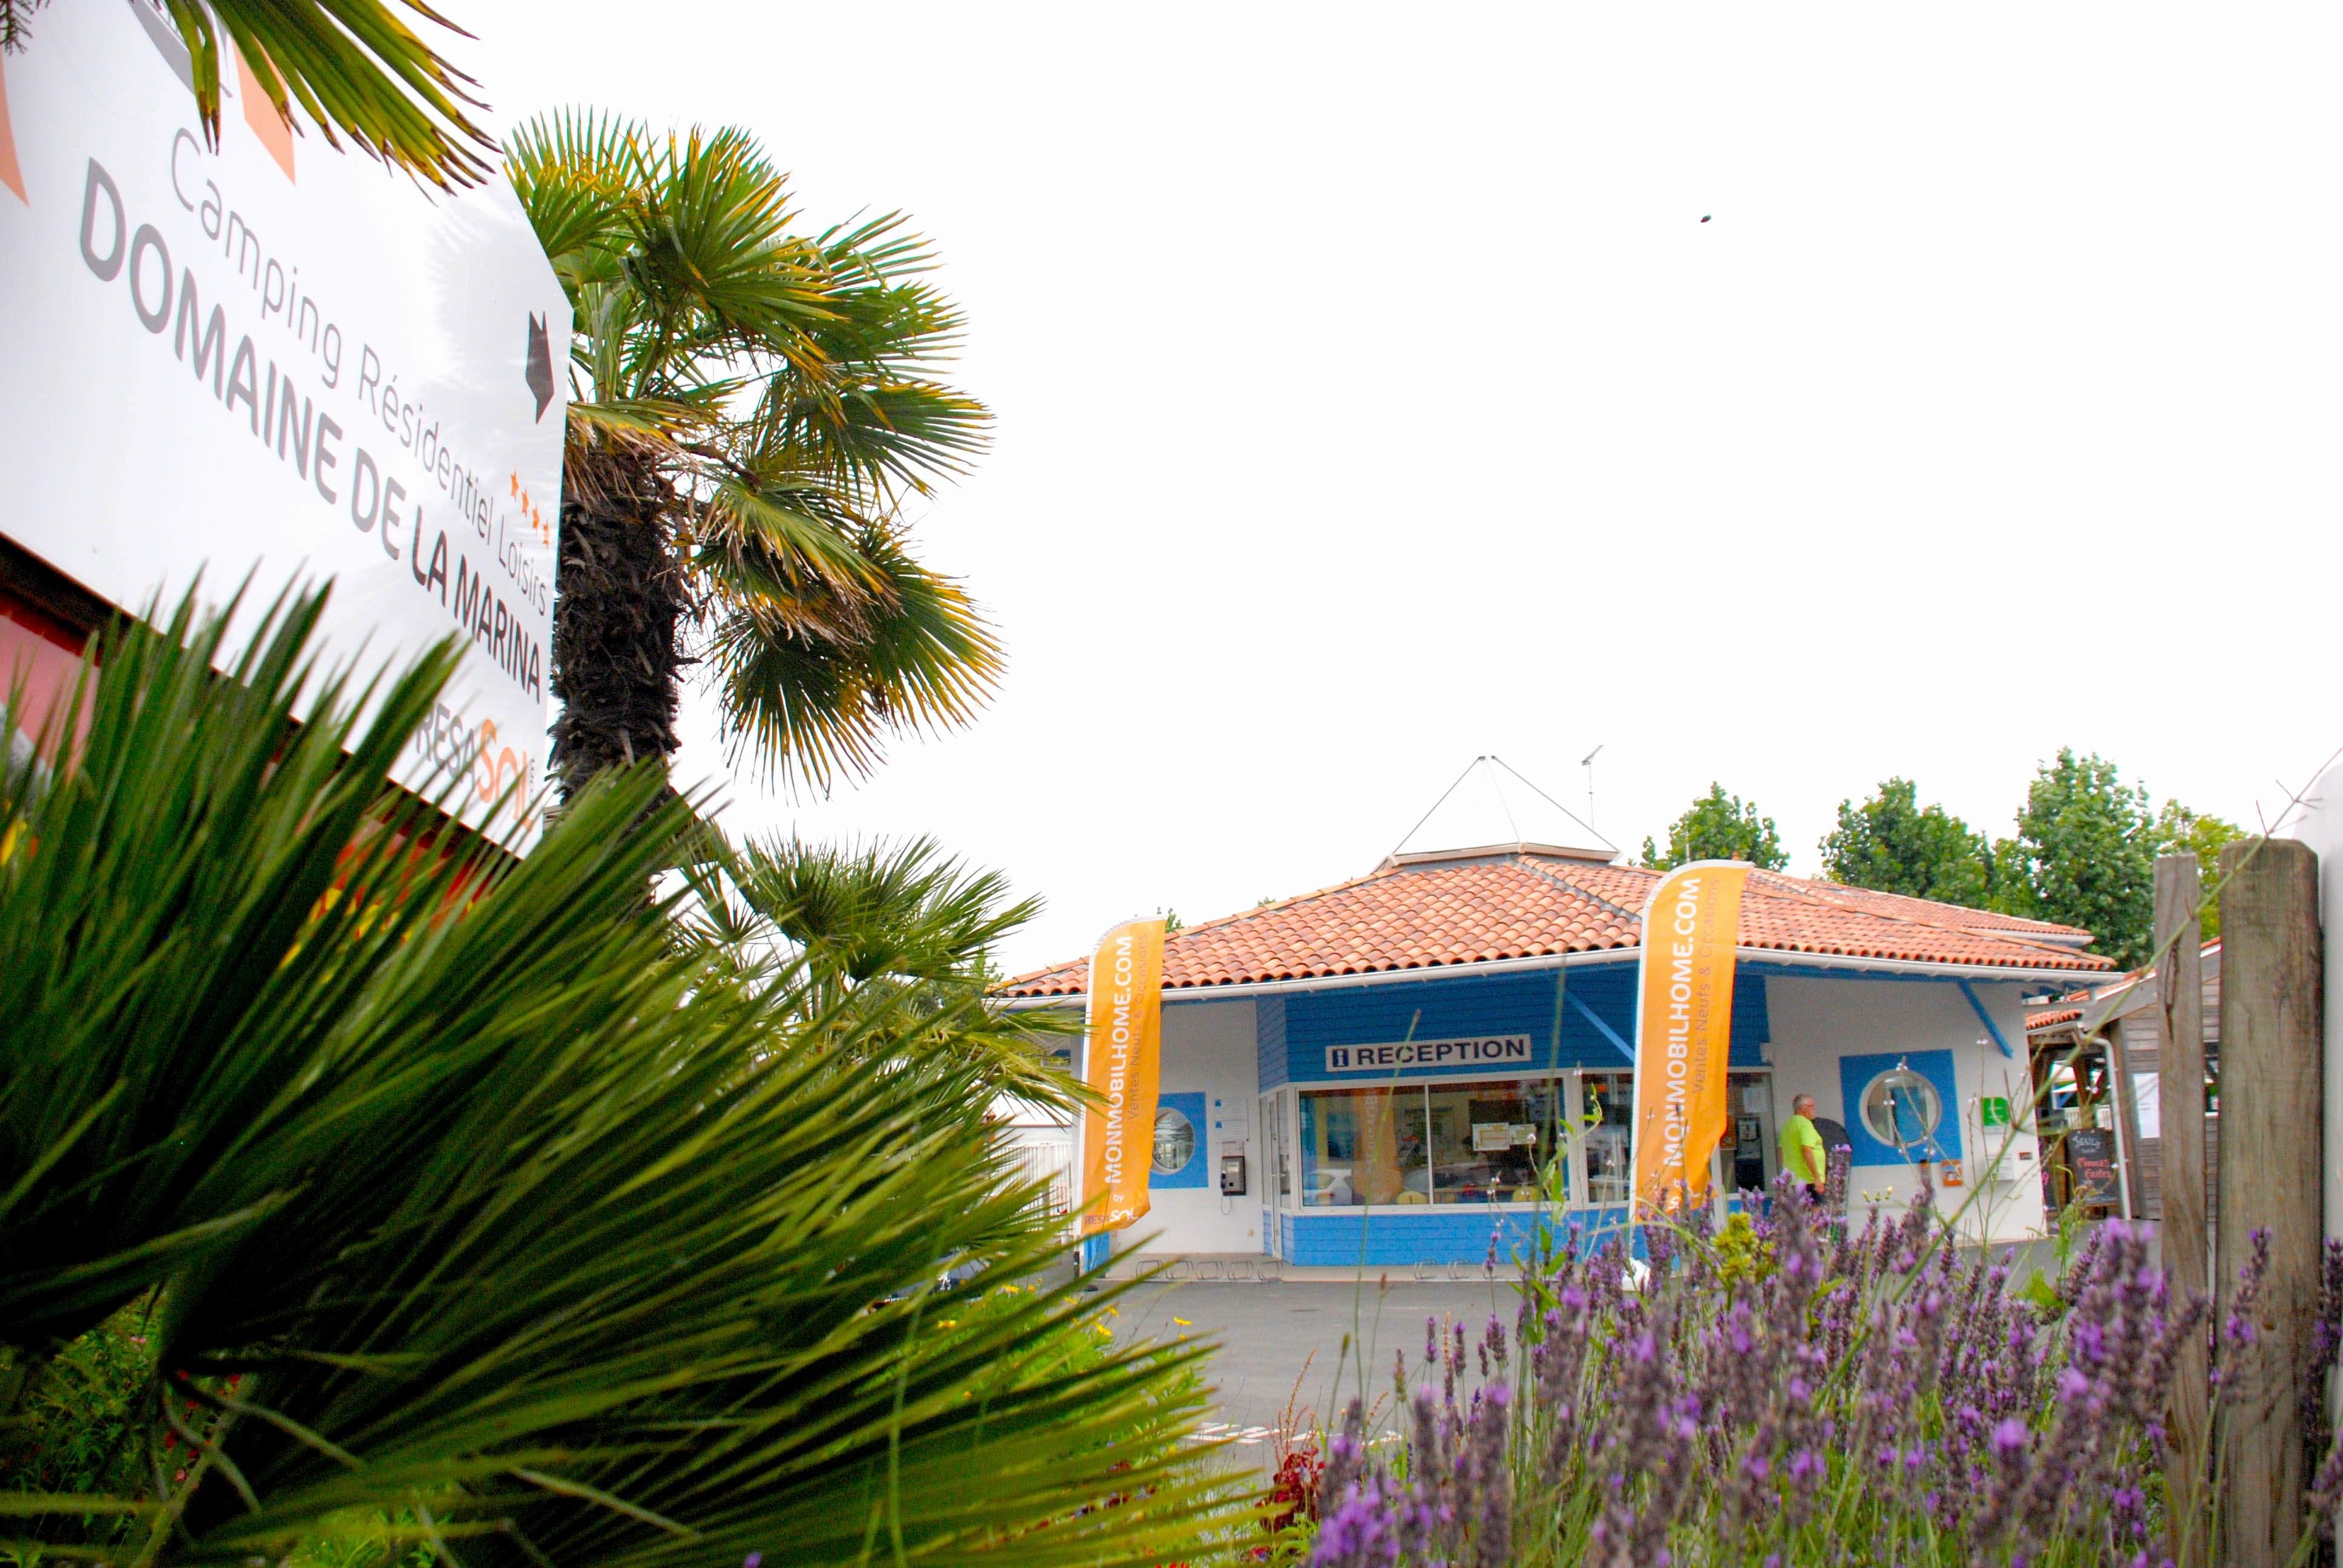 Camping Jardin De Kergal Luxe Photos 7 Magnifique Camping Les Jardins De Kergal Galerie De Cuisine